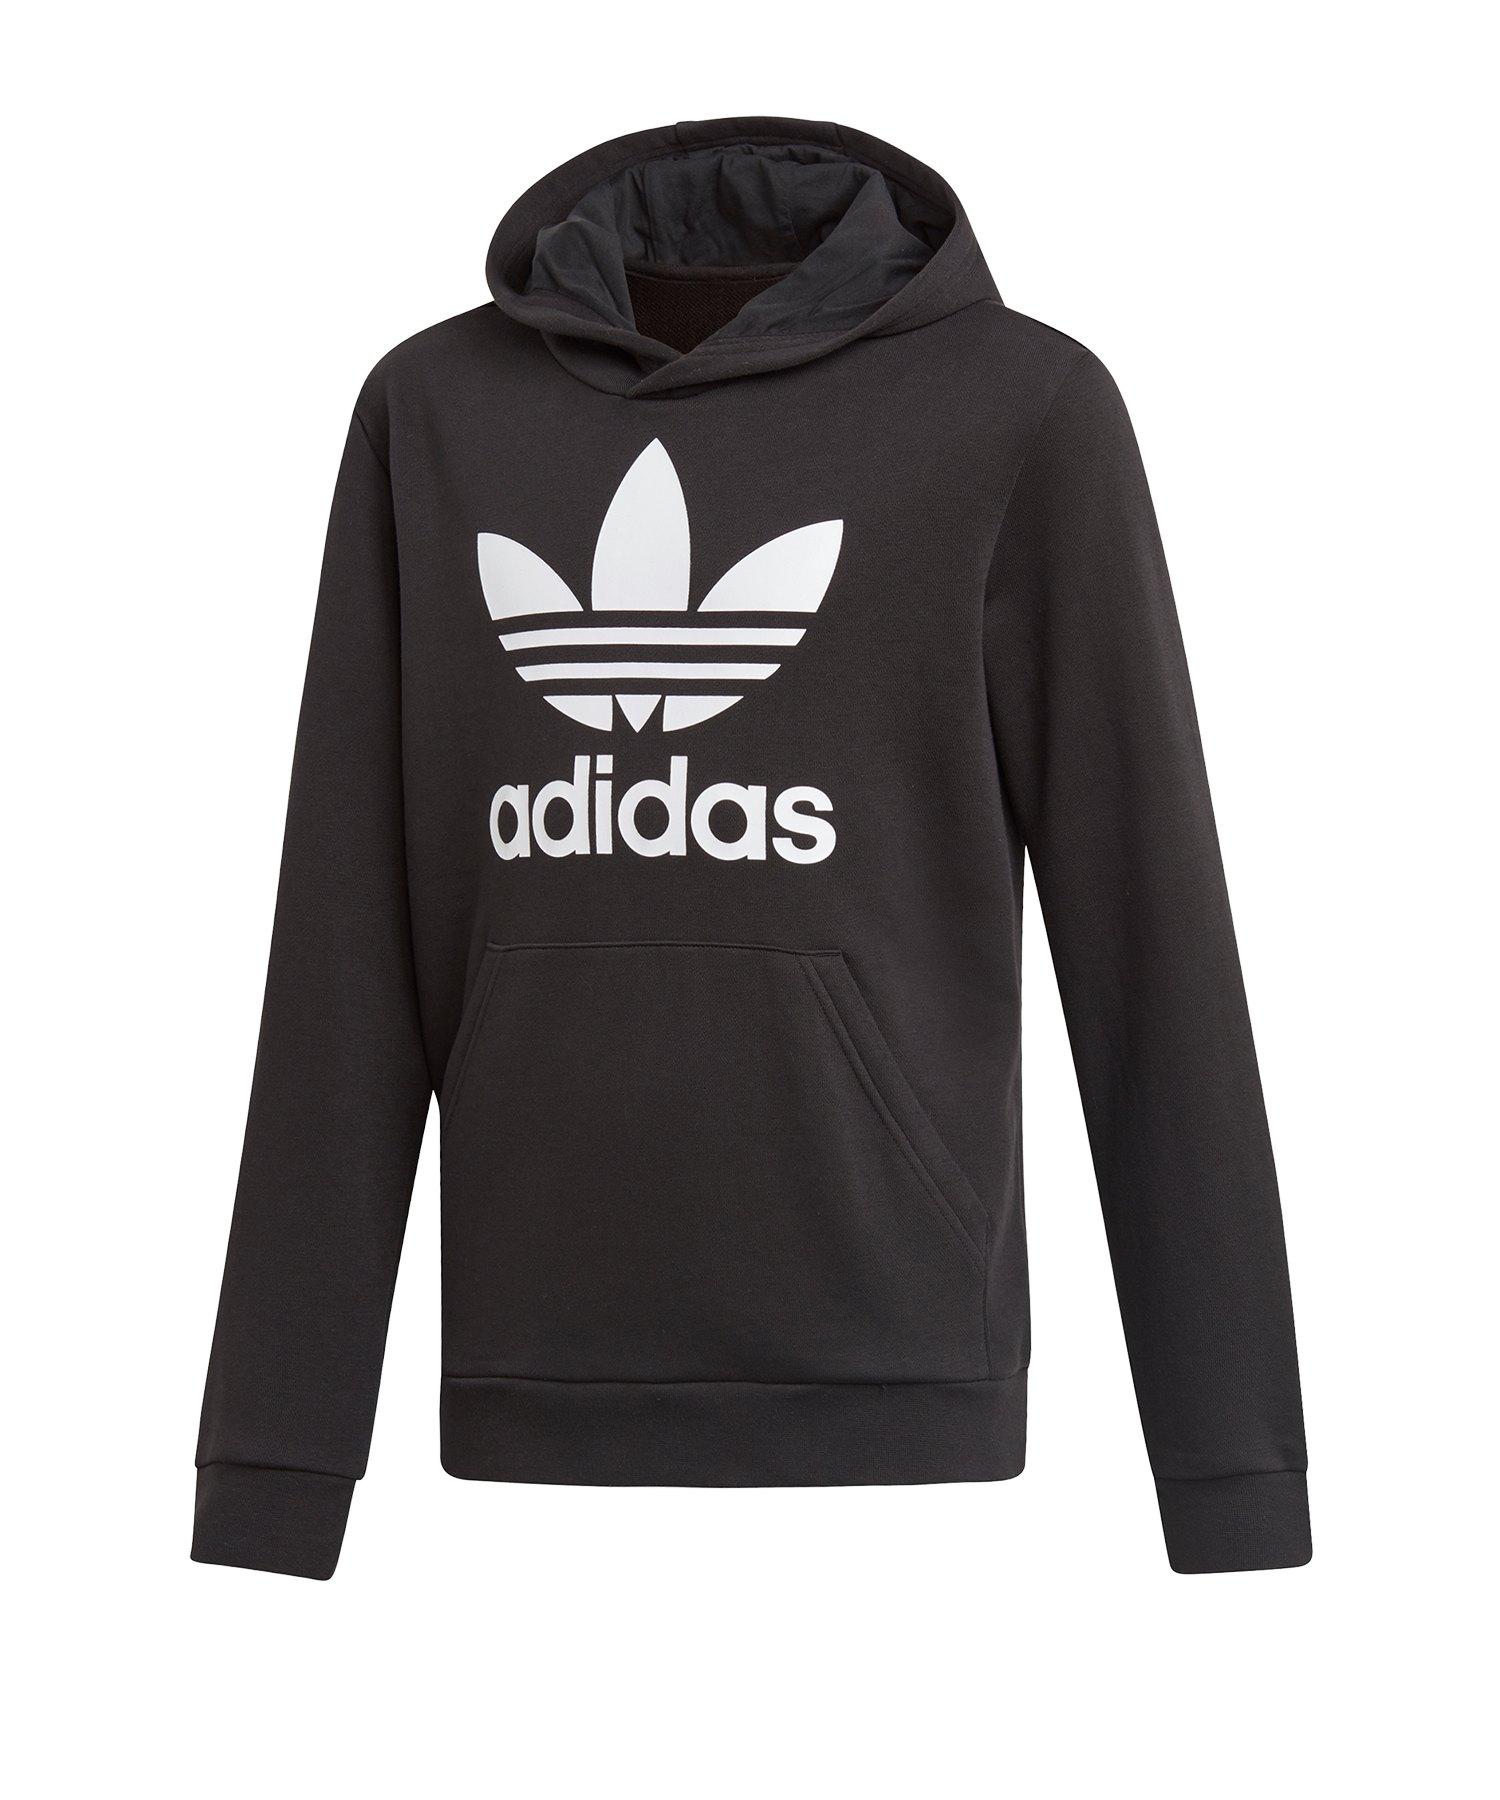 Mode Bestbewerteter Rabatt größter Rabatt adidas Originals Kapuzensweatshirt Kids Grün